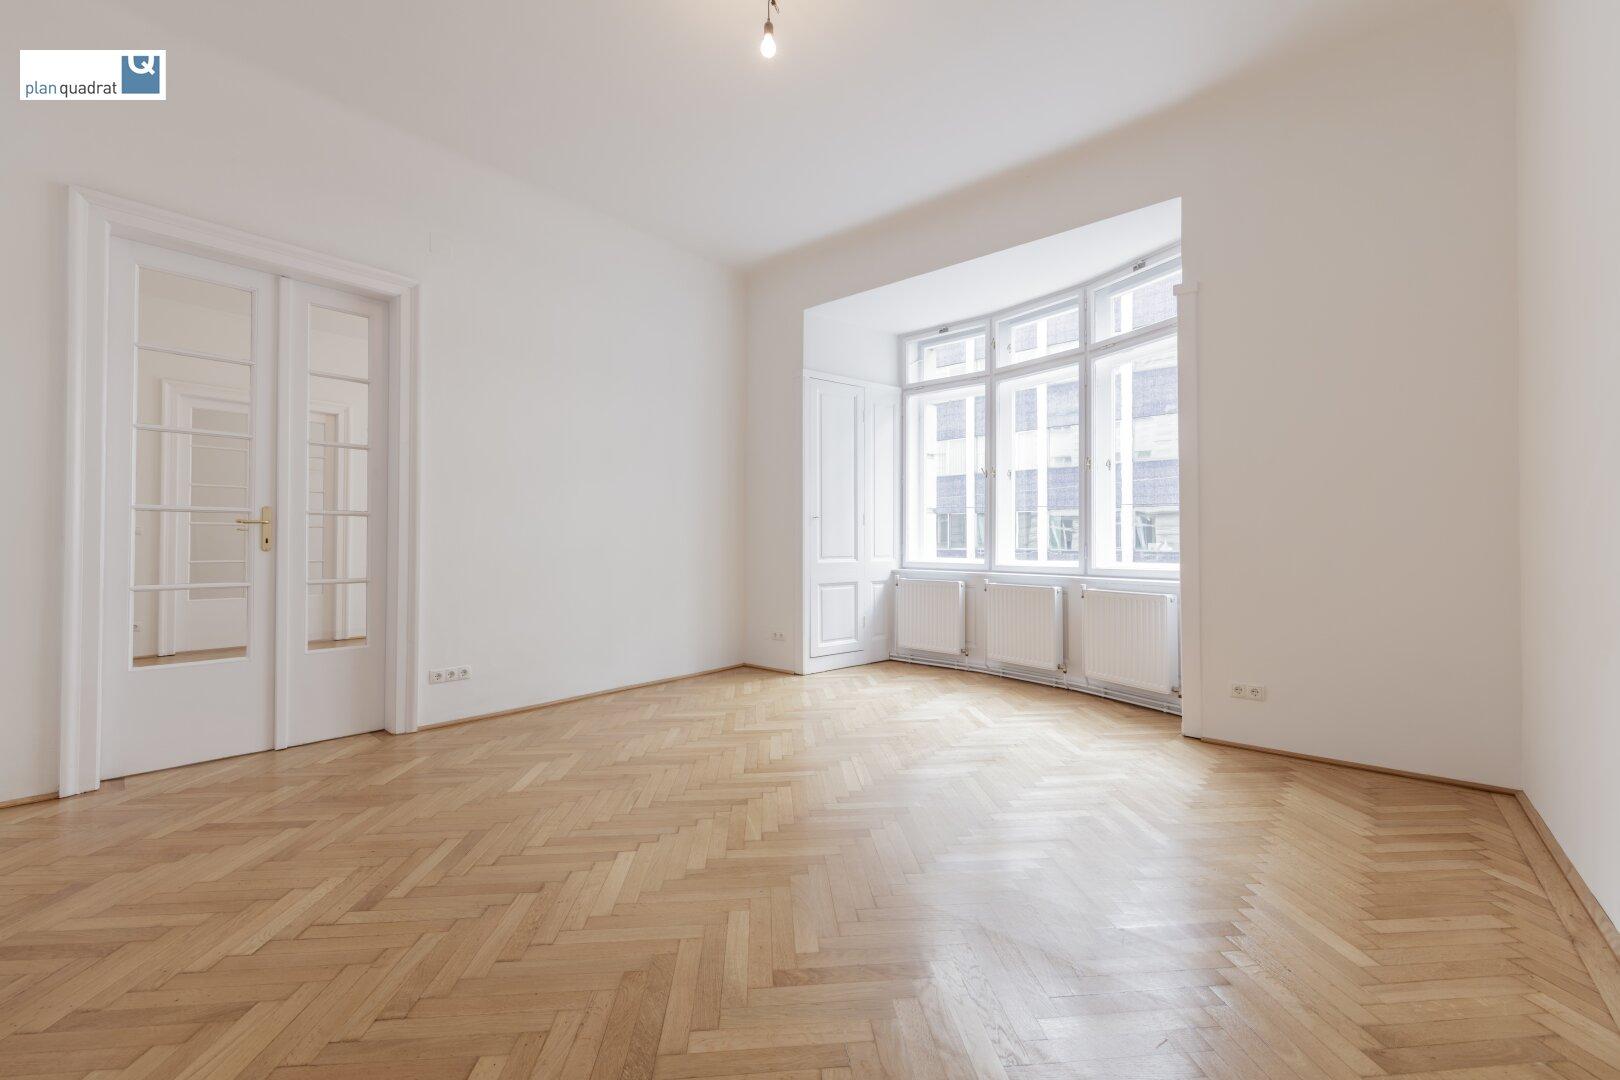 Büroraum 4 (gem. Grundriss - ca. 21,40 qm)